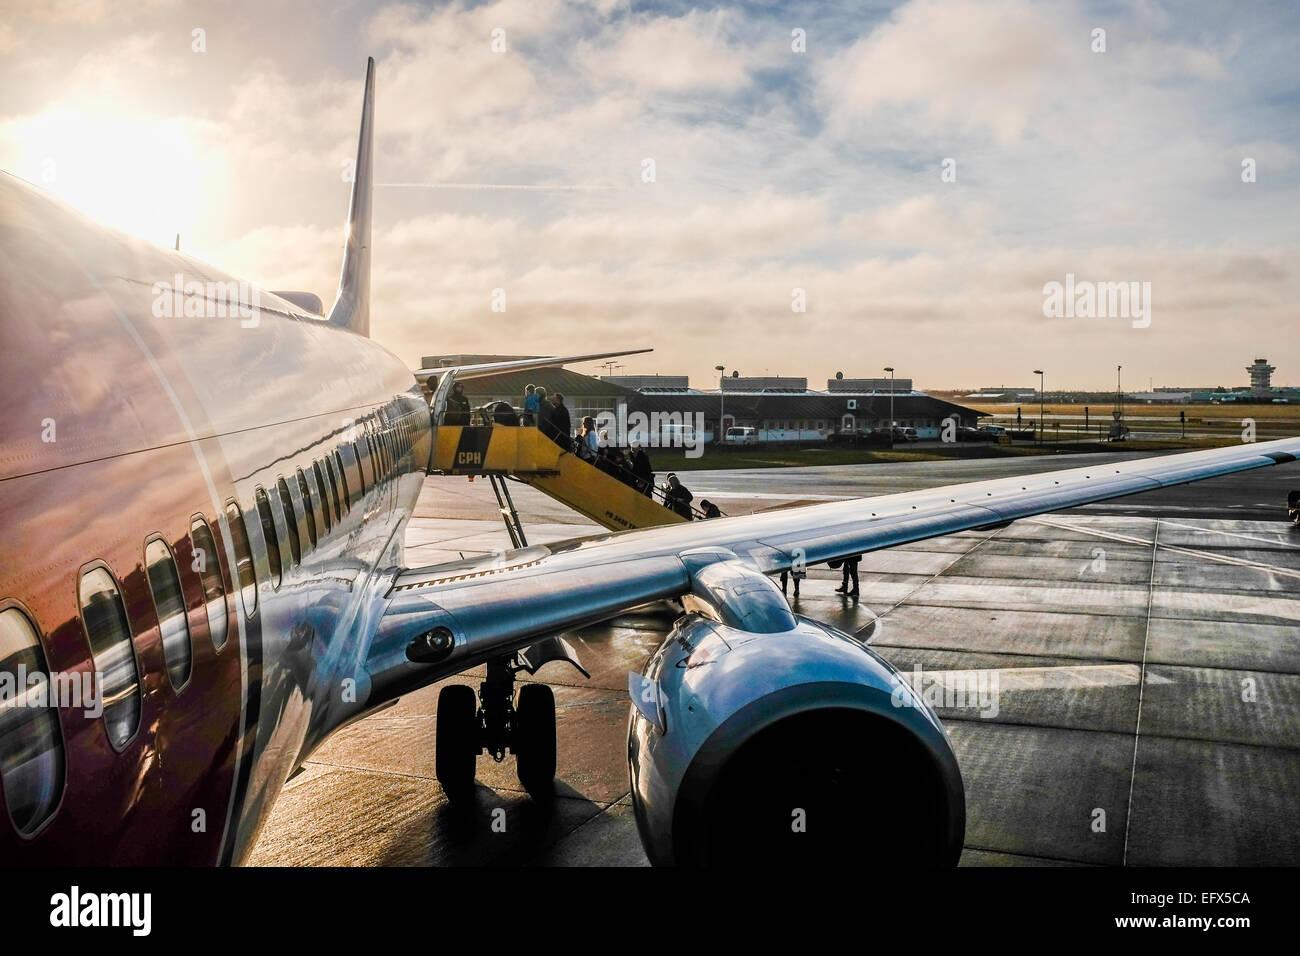 boarding a European flight from Edinburgh - Stock Image